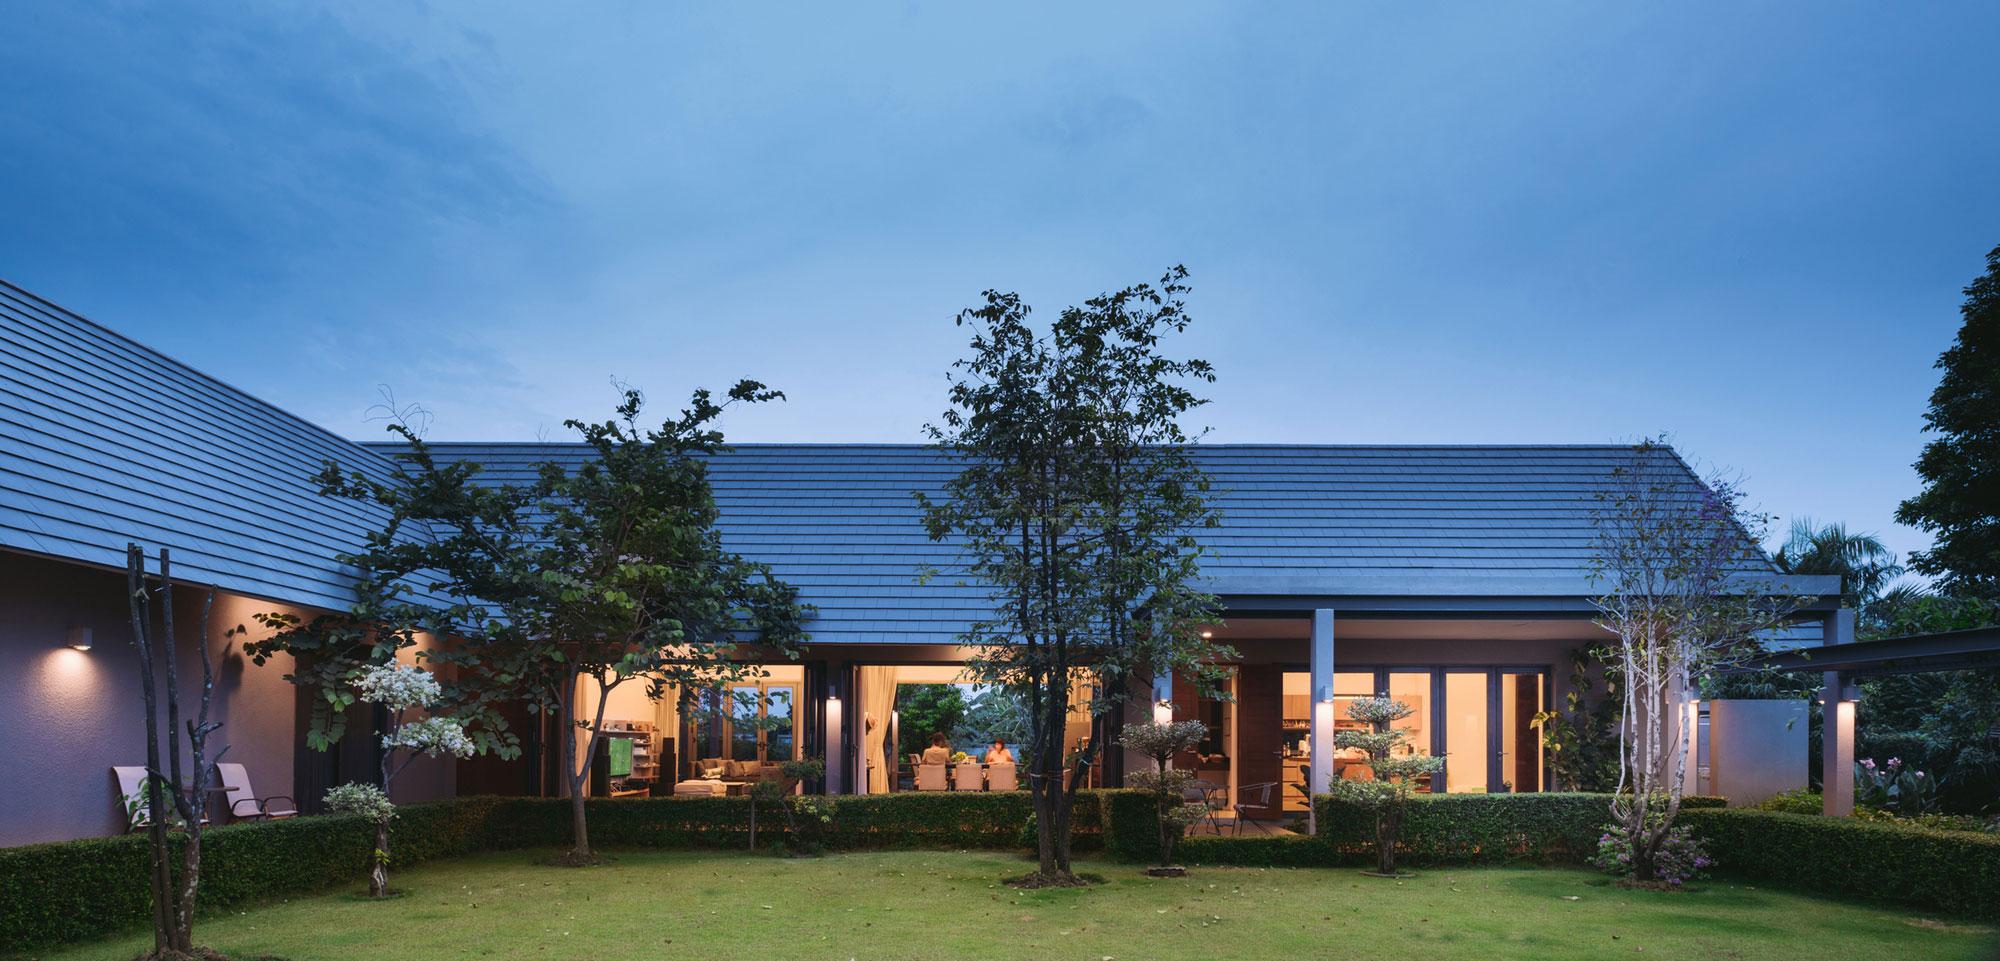 The Triangle House near Bangkok by Phongphat Ueasangkhomset-22